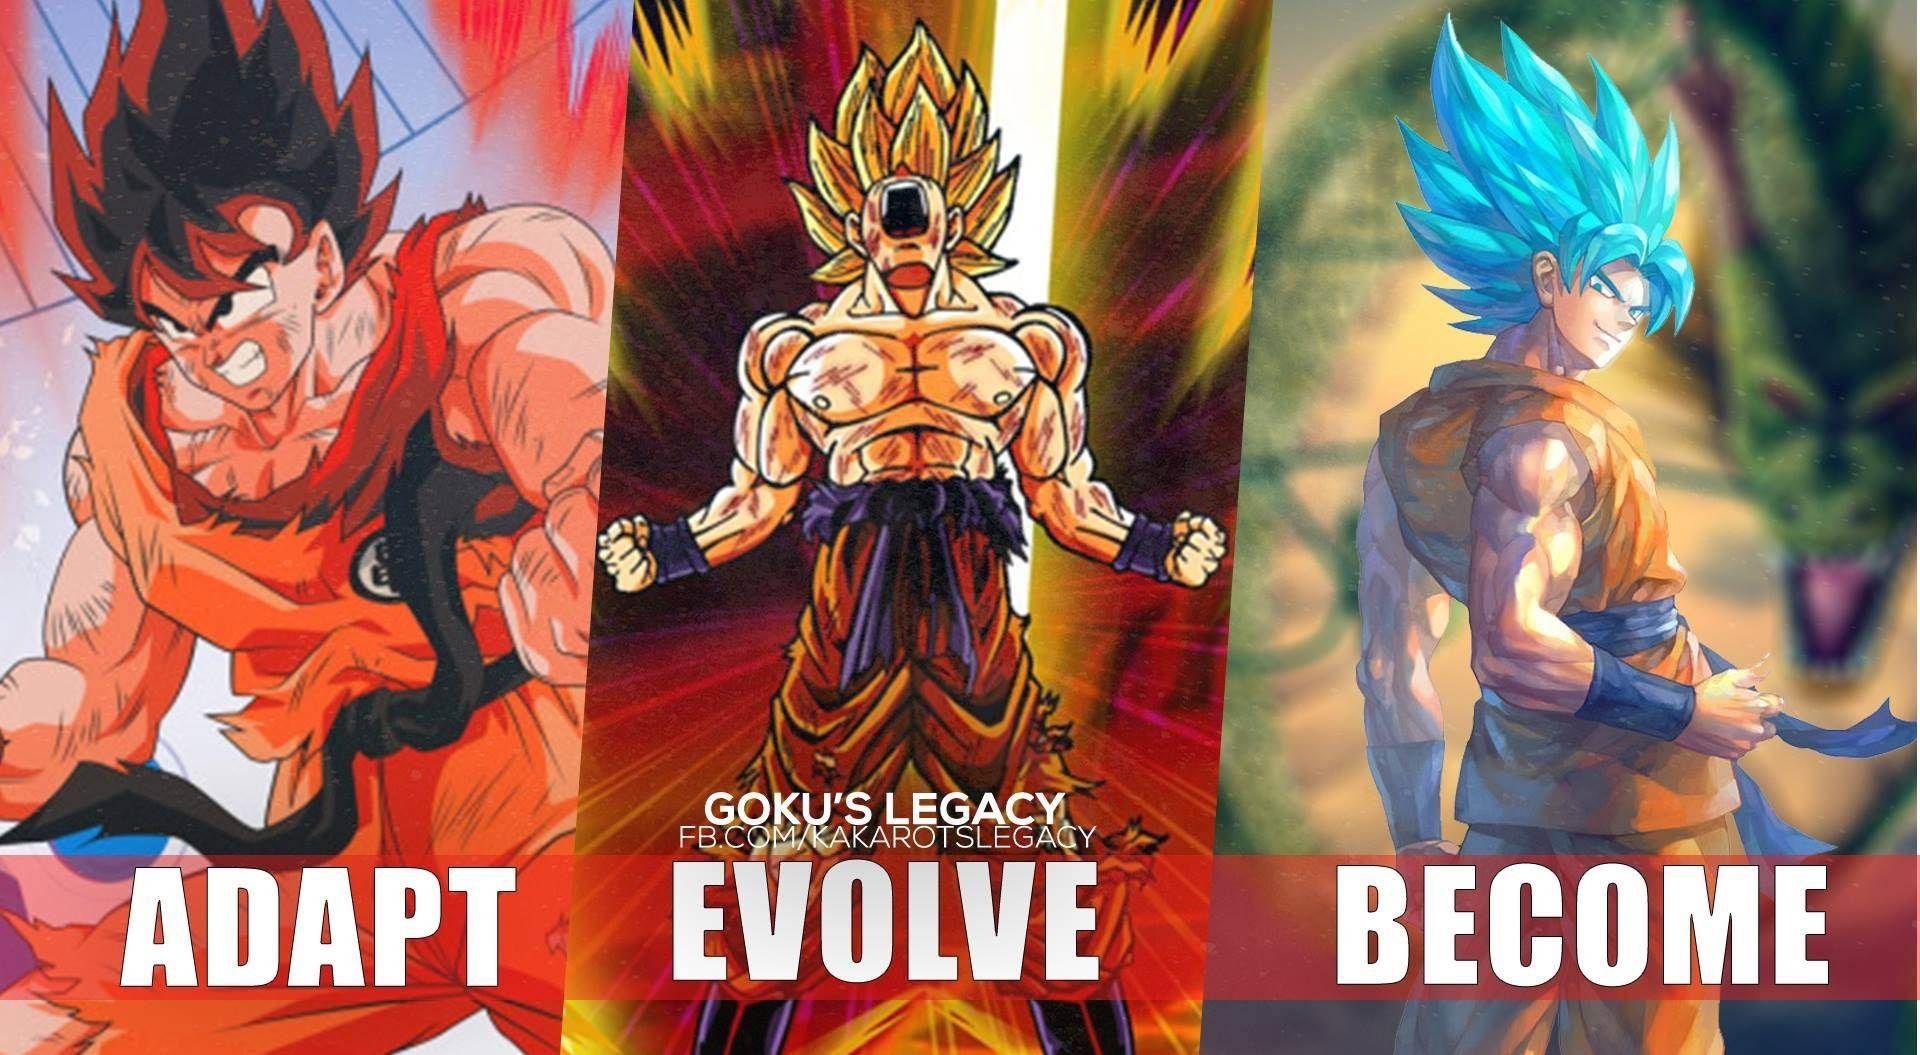 Super Saiyan Goku Wallpaper Group 1920x1055 4 HD Wallpapers